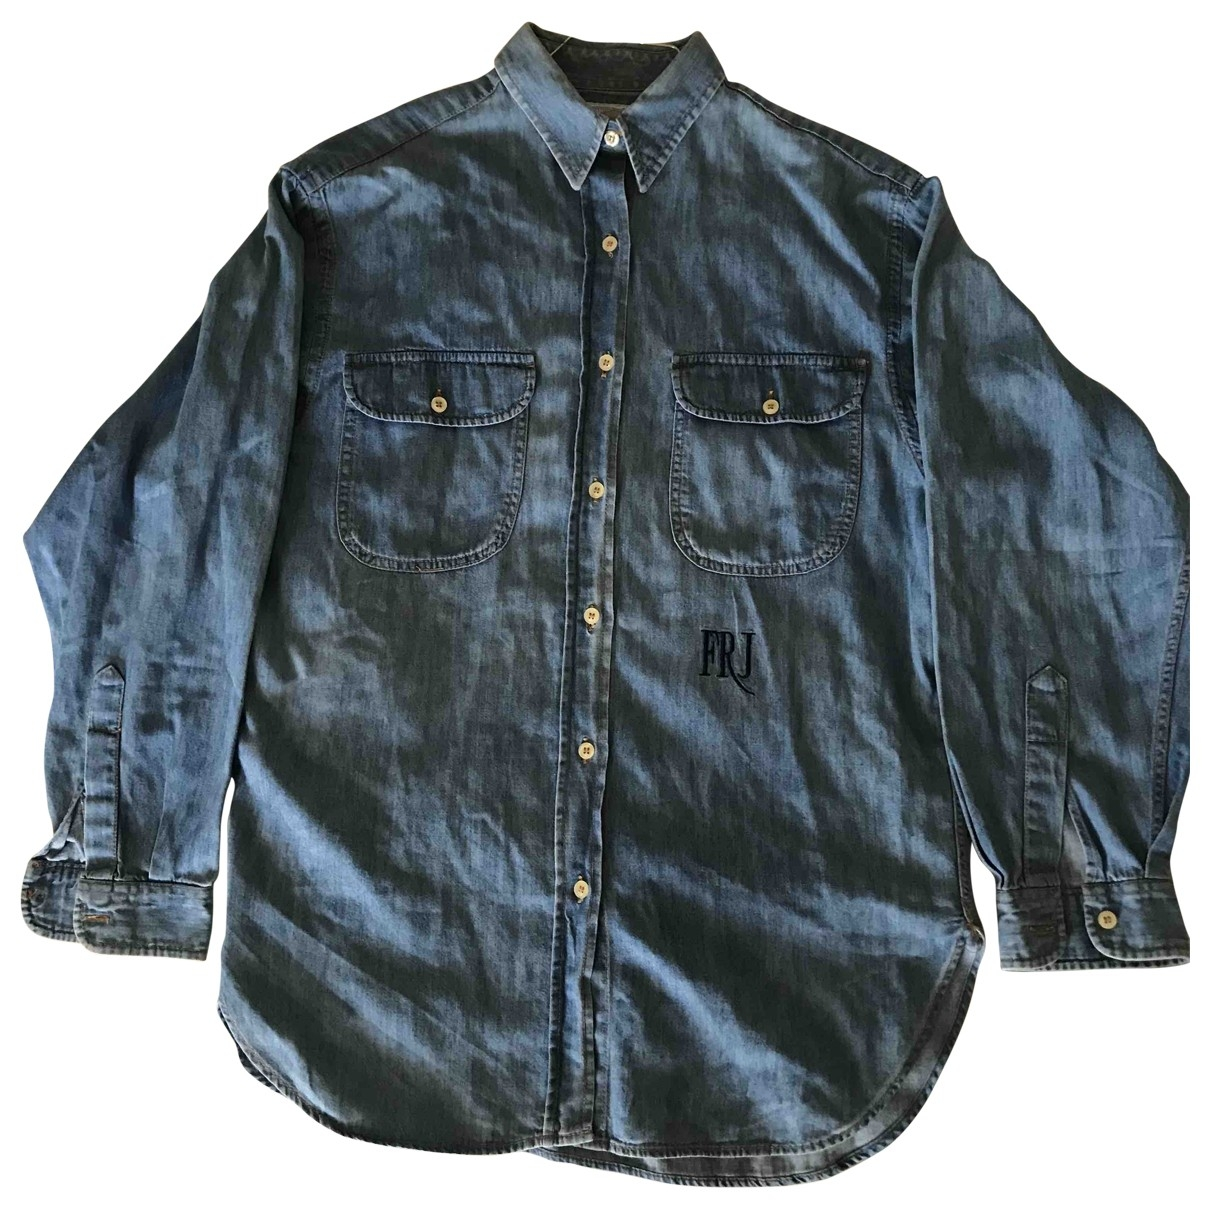 Gianfranco Ferre \N Top in  Blau Denim - Jeans